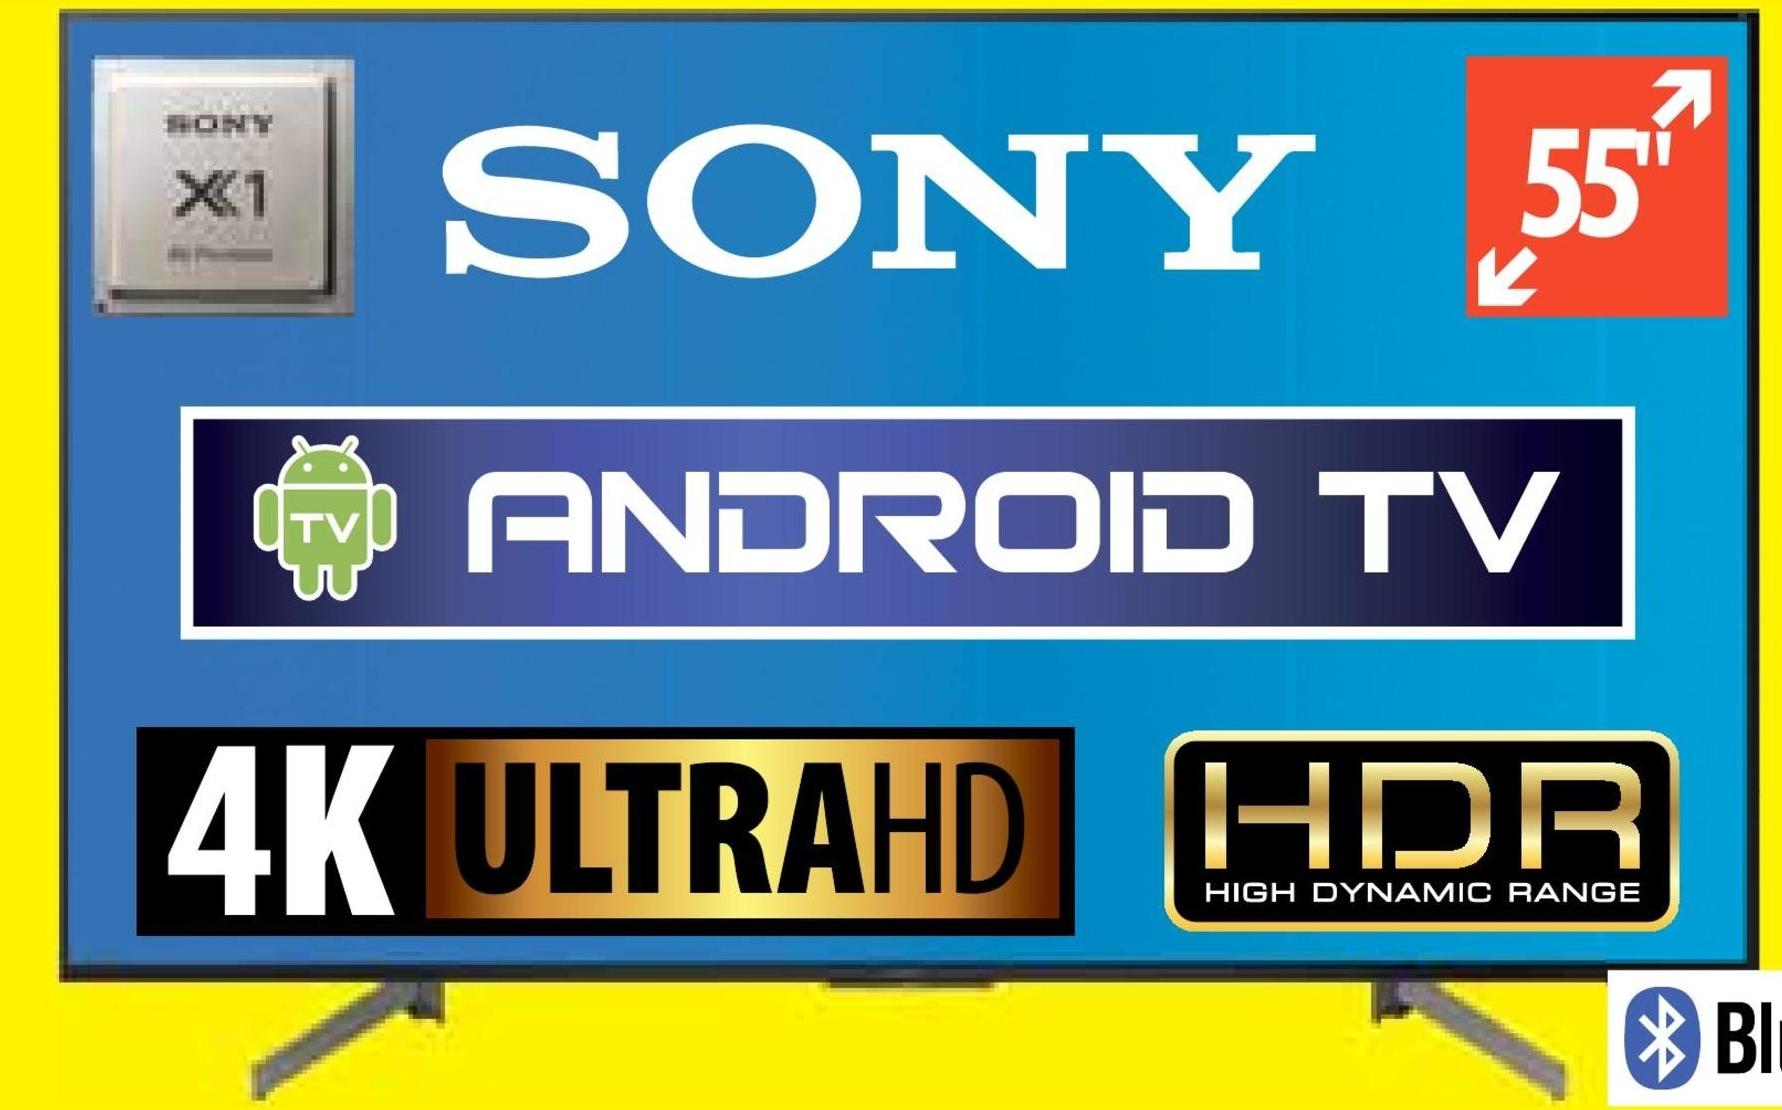 Telewizor LED KD-55XG8596 Sony niska cena